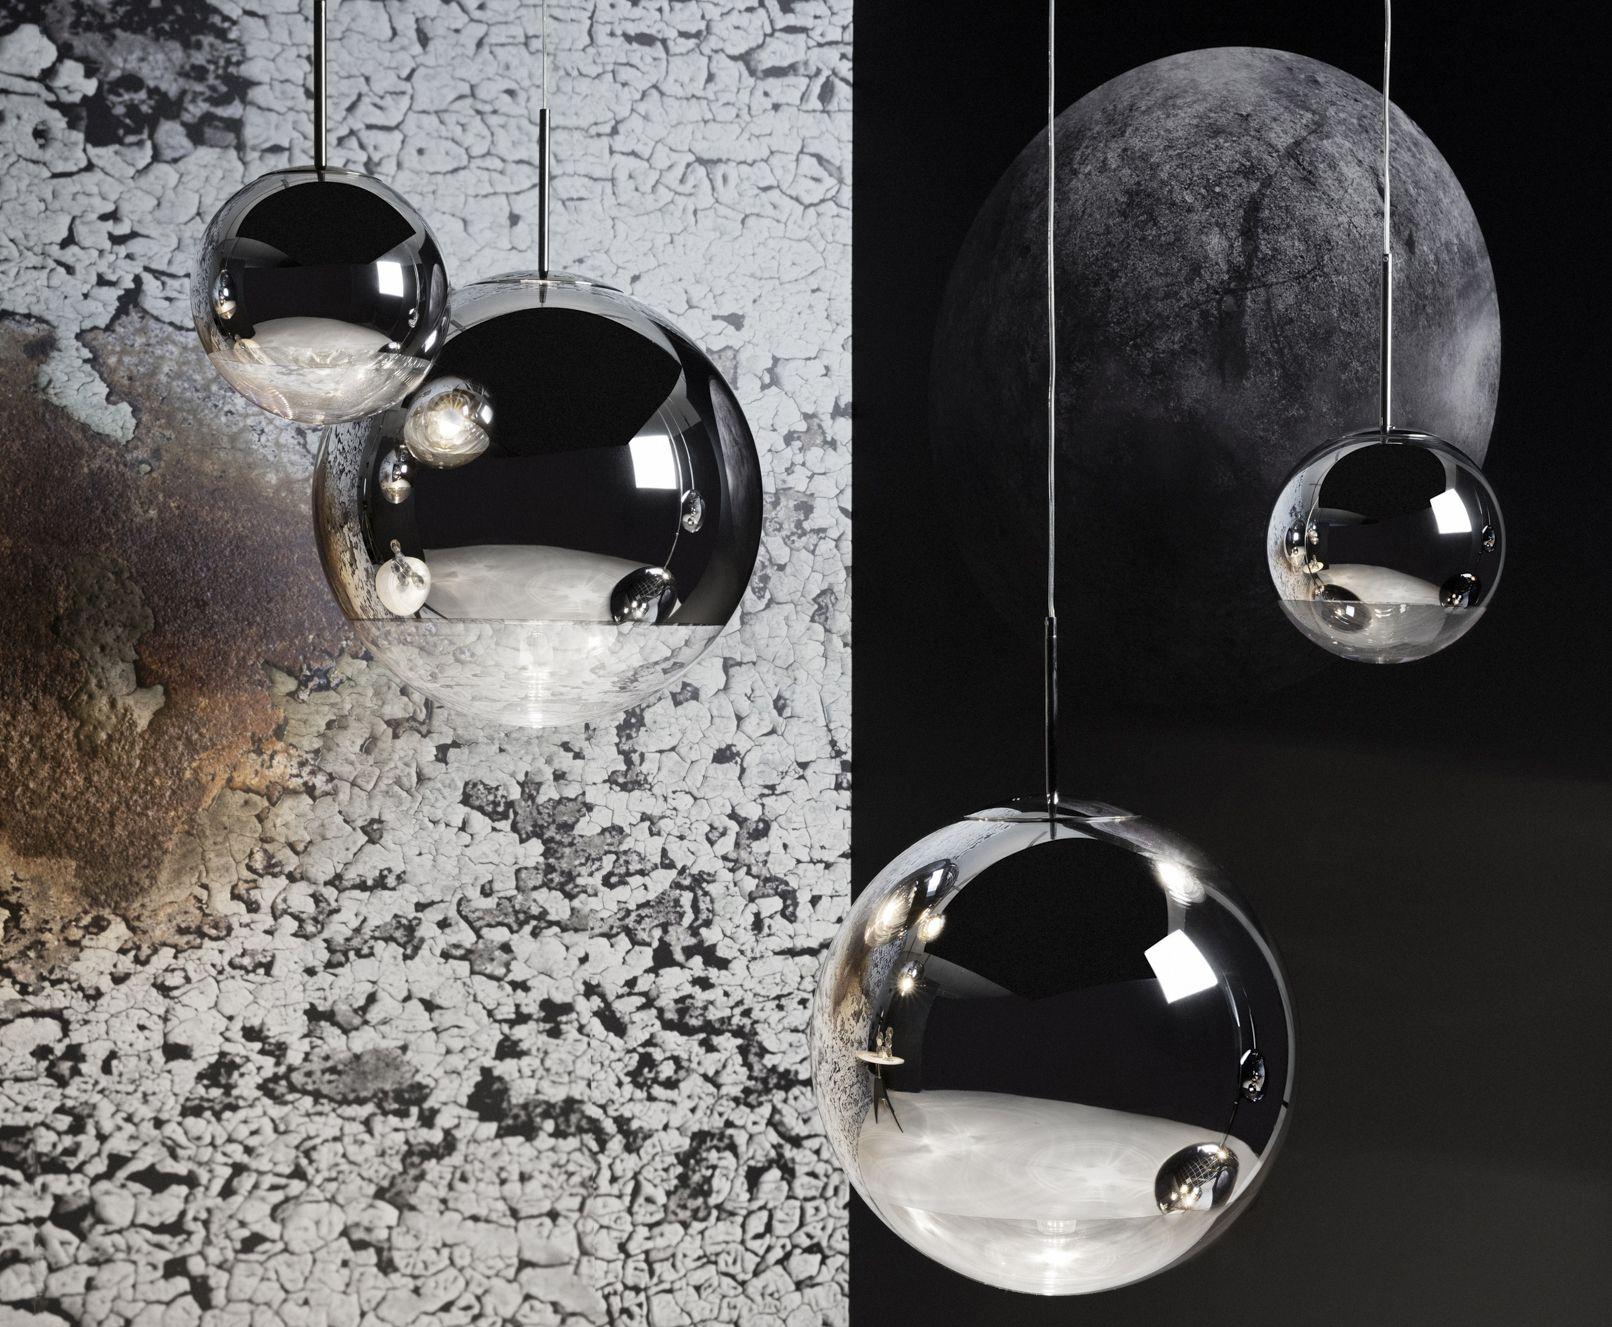 copper pendant light kitchen memory foam mats mirror ball | designed by tom dixon, orange skin